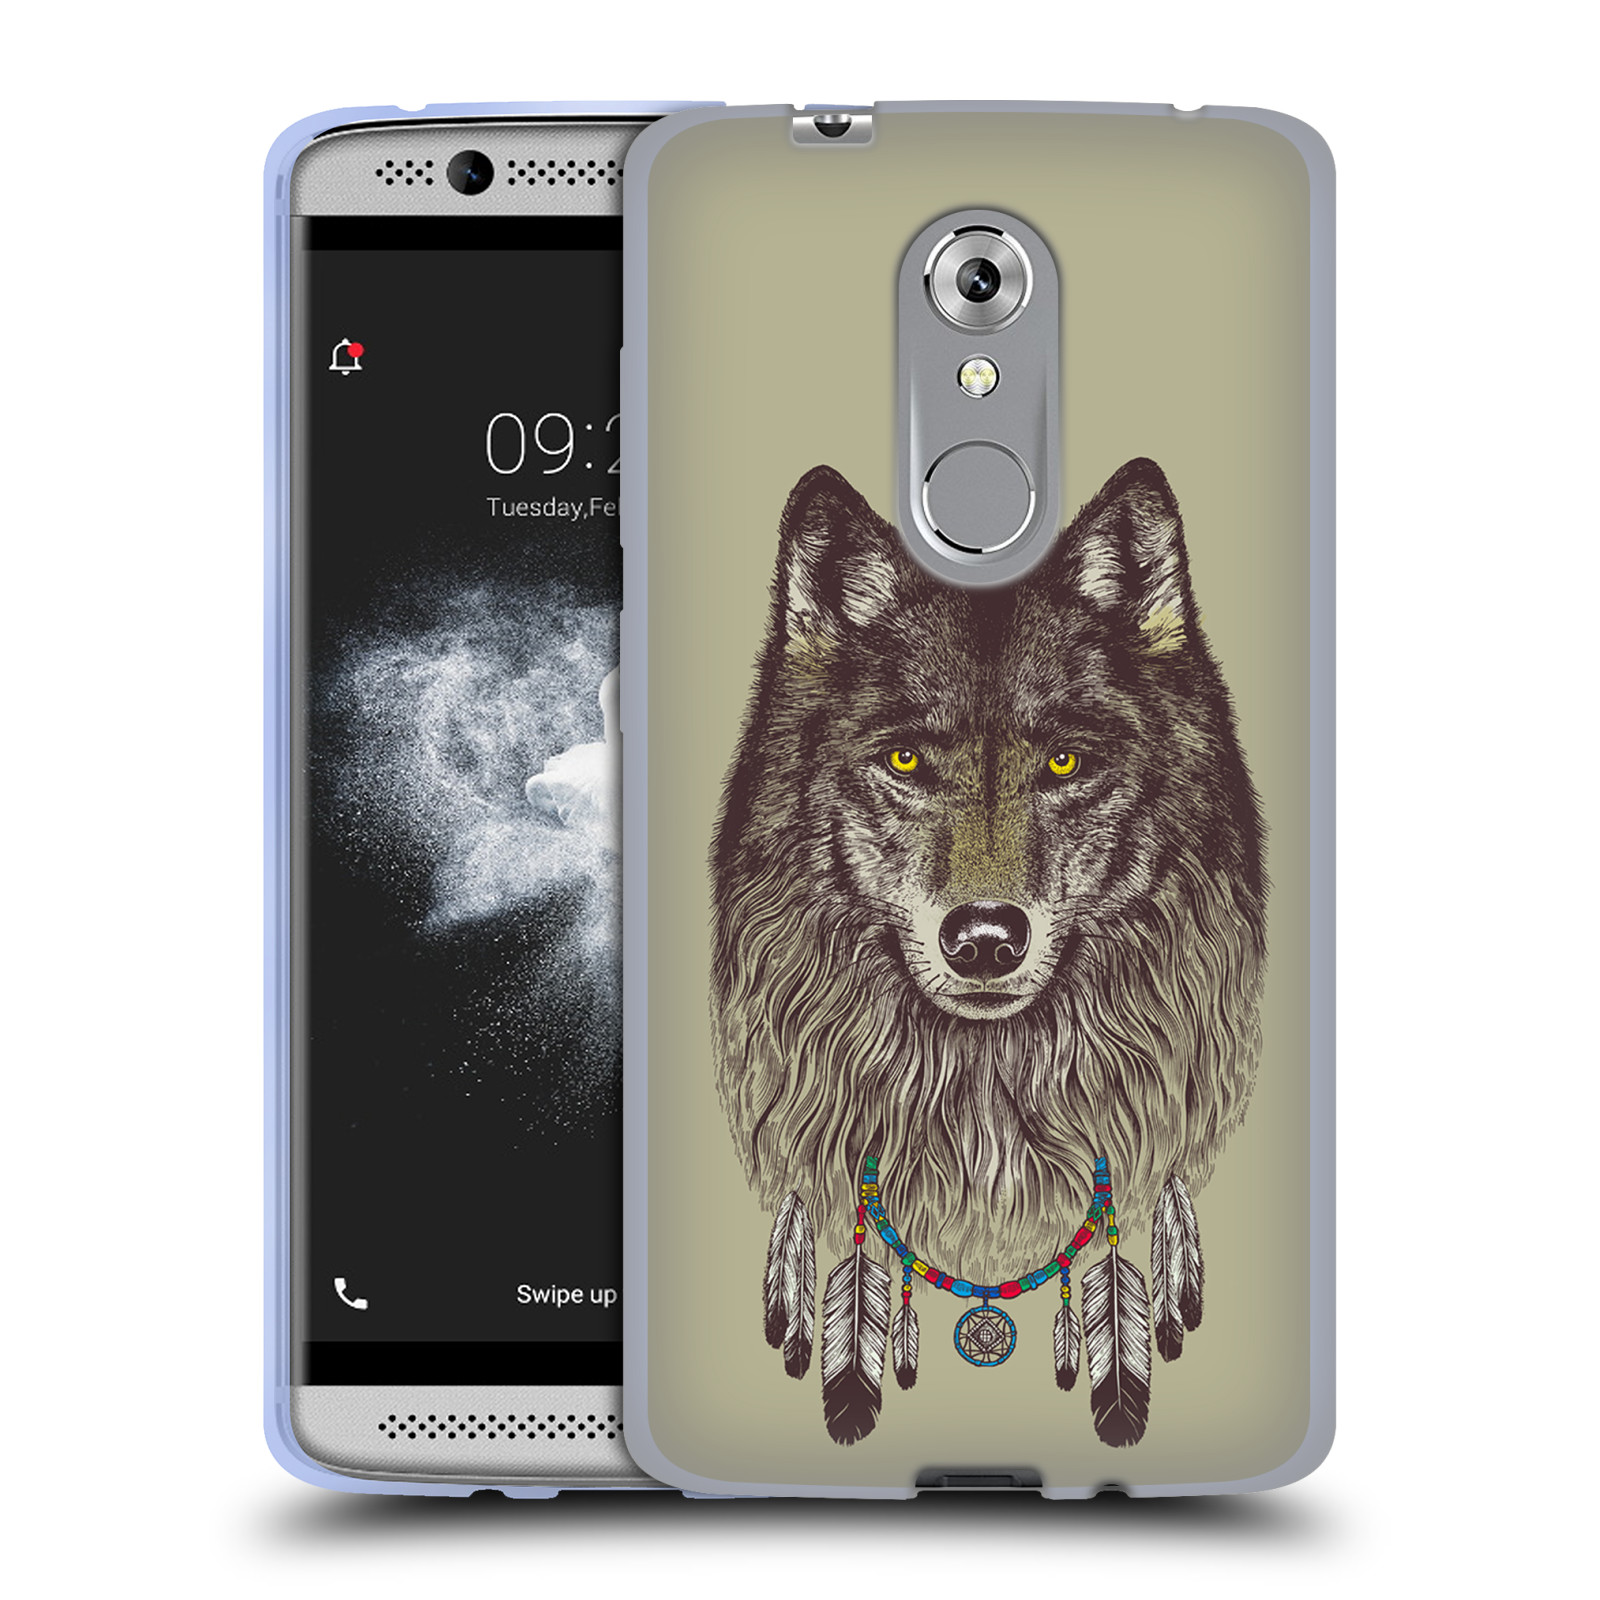 OFFICIAL-RACHEL-CALDWELL-ANIMALS-3-SOFT-GEL-CASE-FOR-ZTE-PHONES